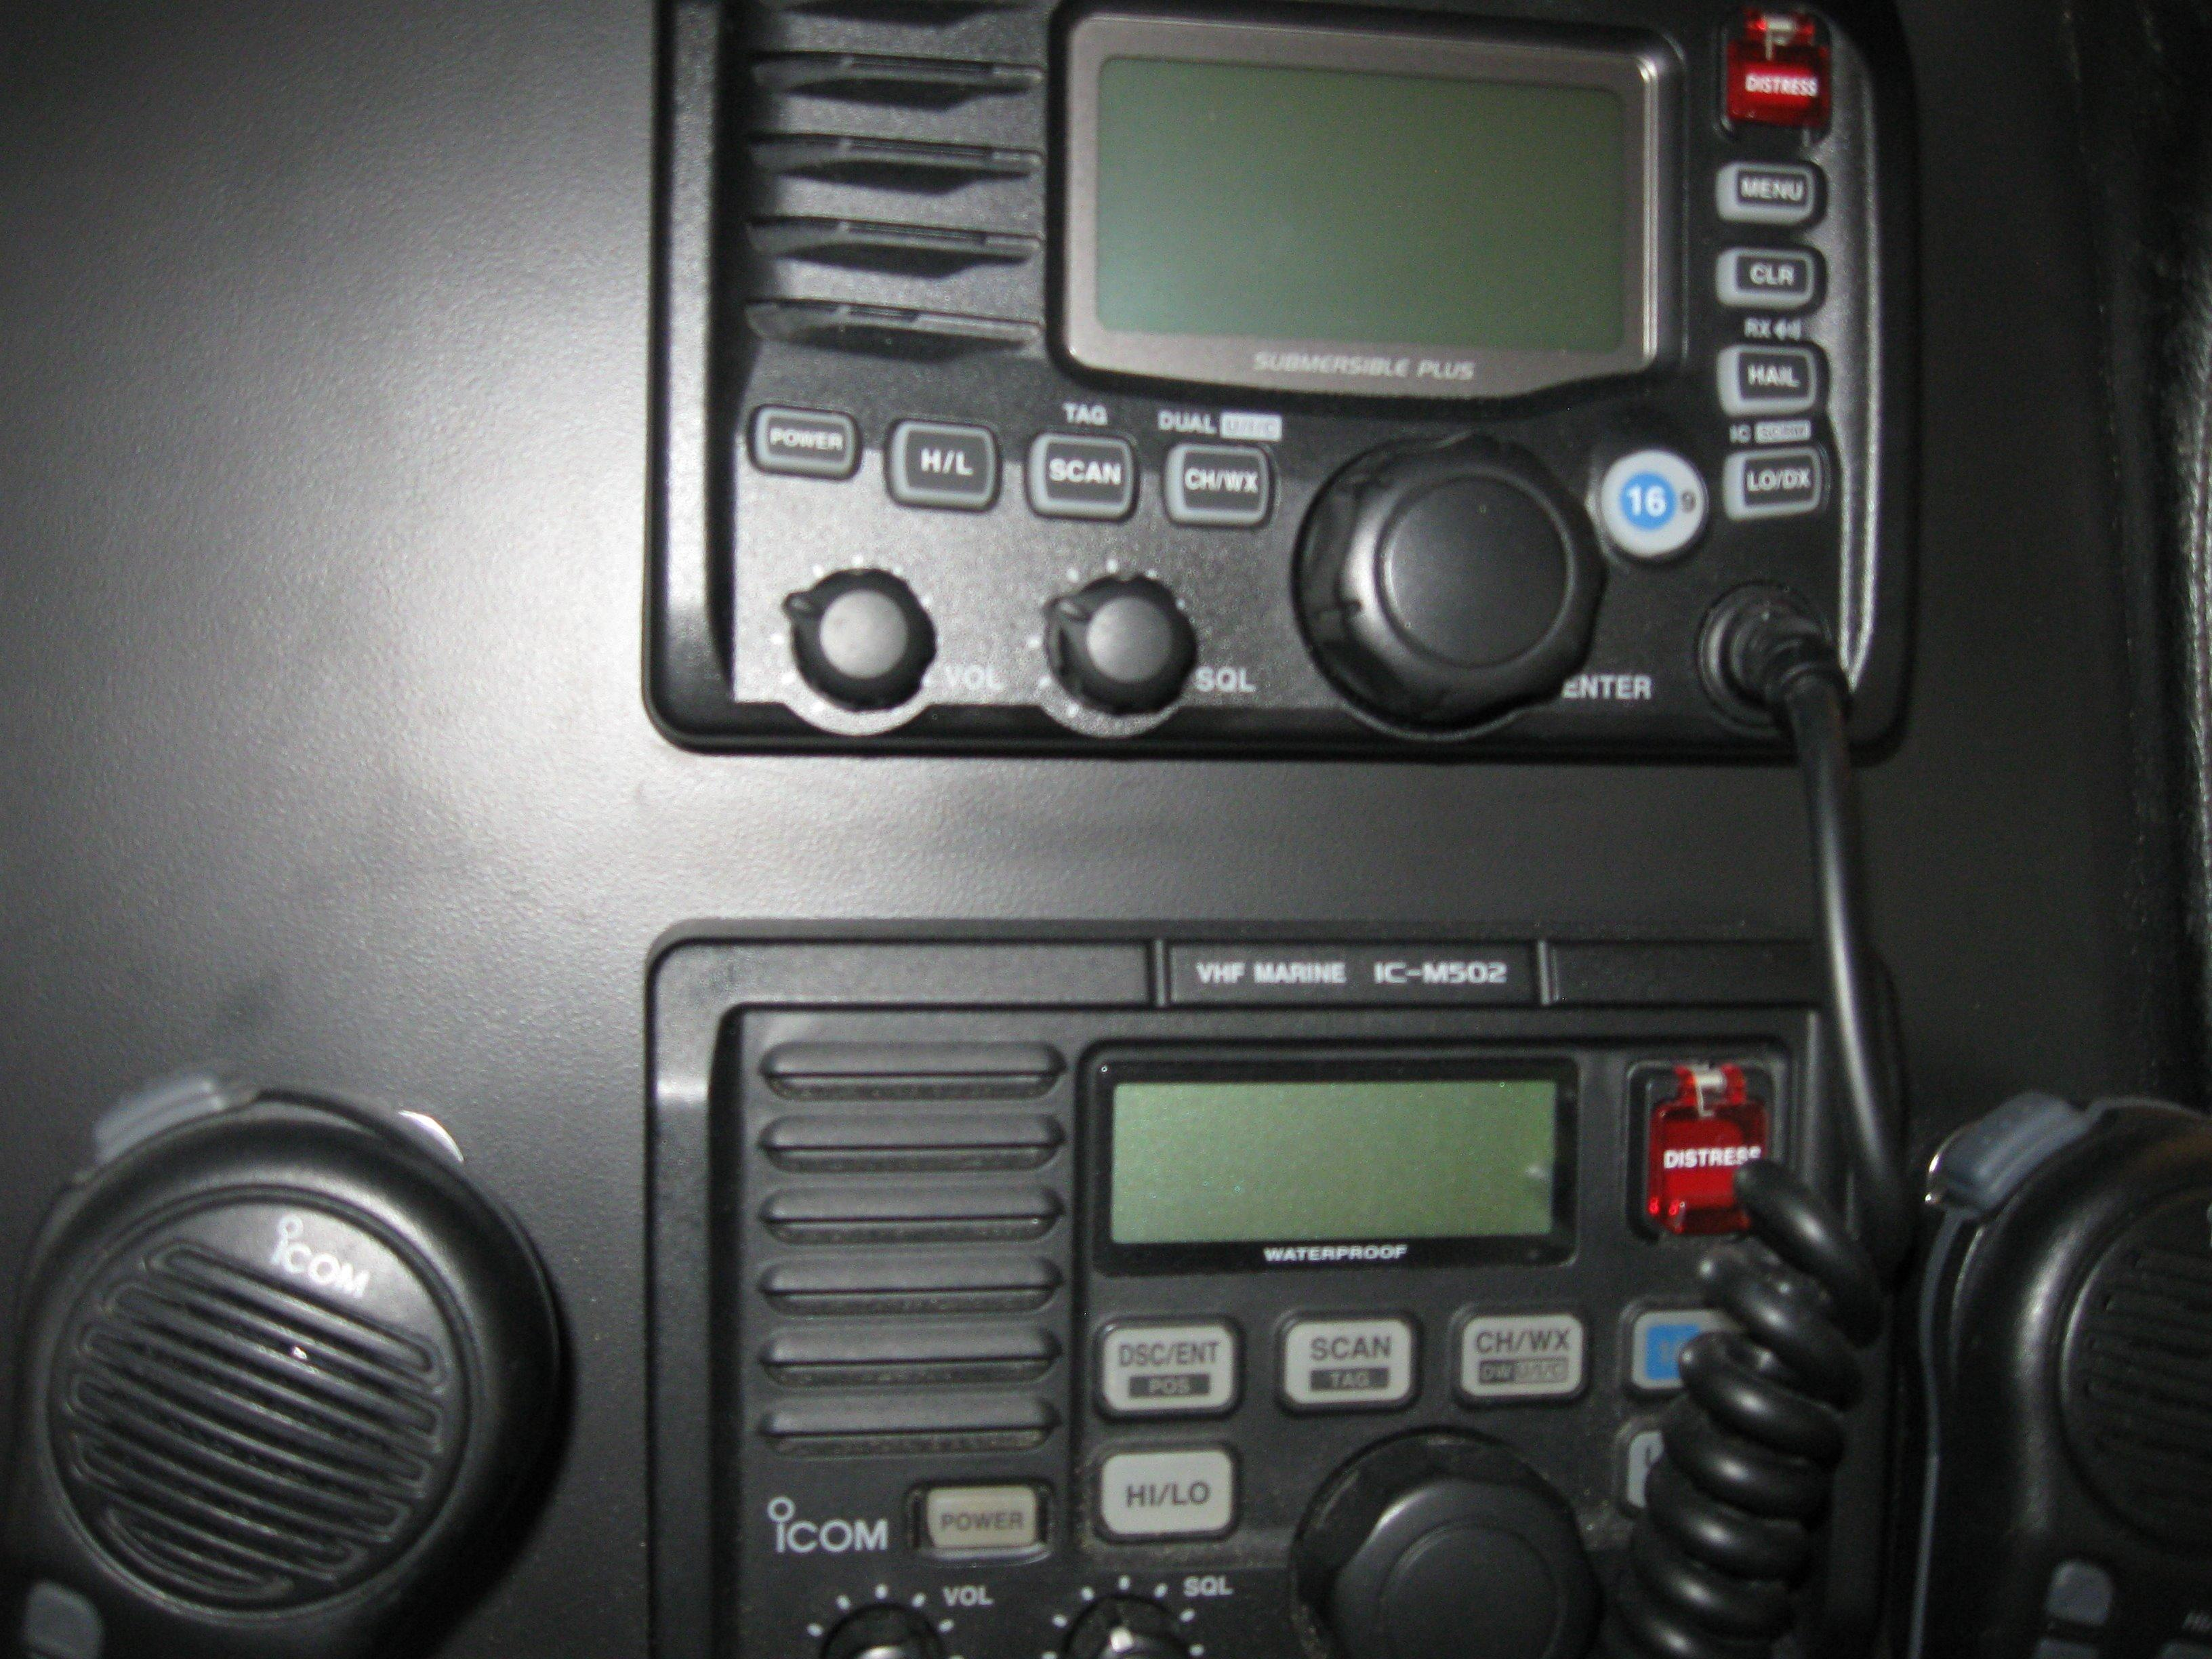 Twin Icom VHF radios